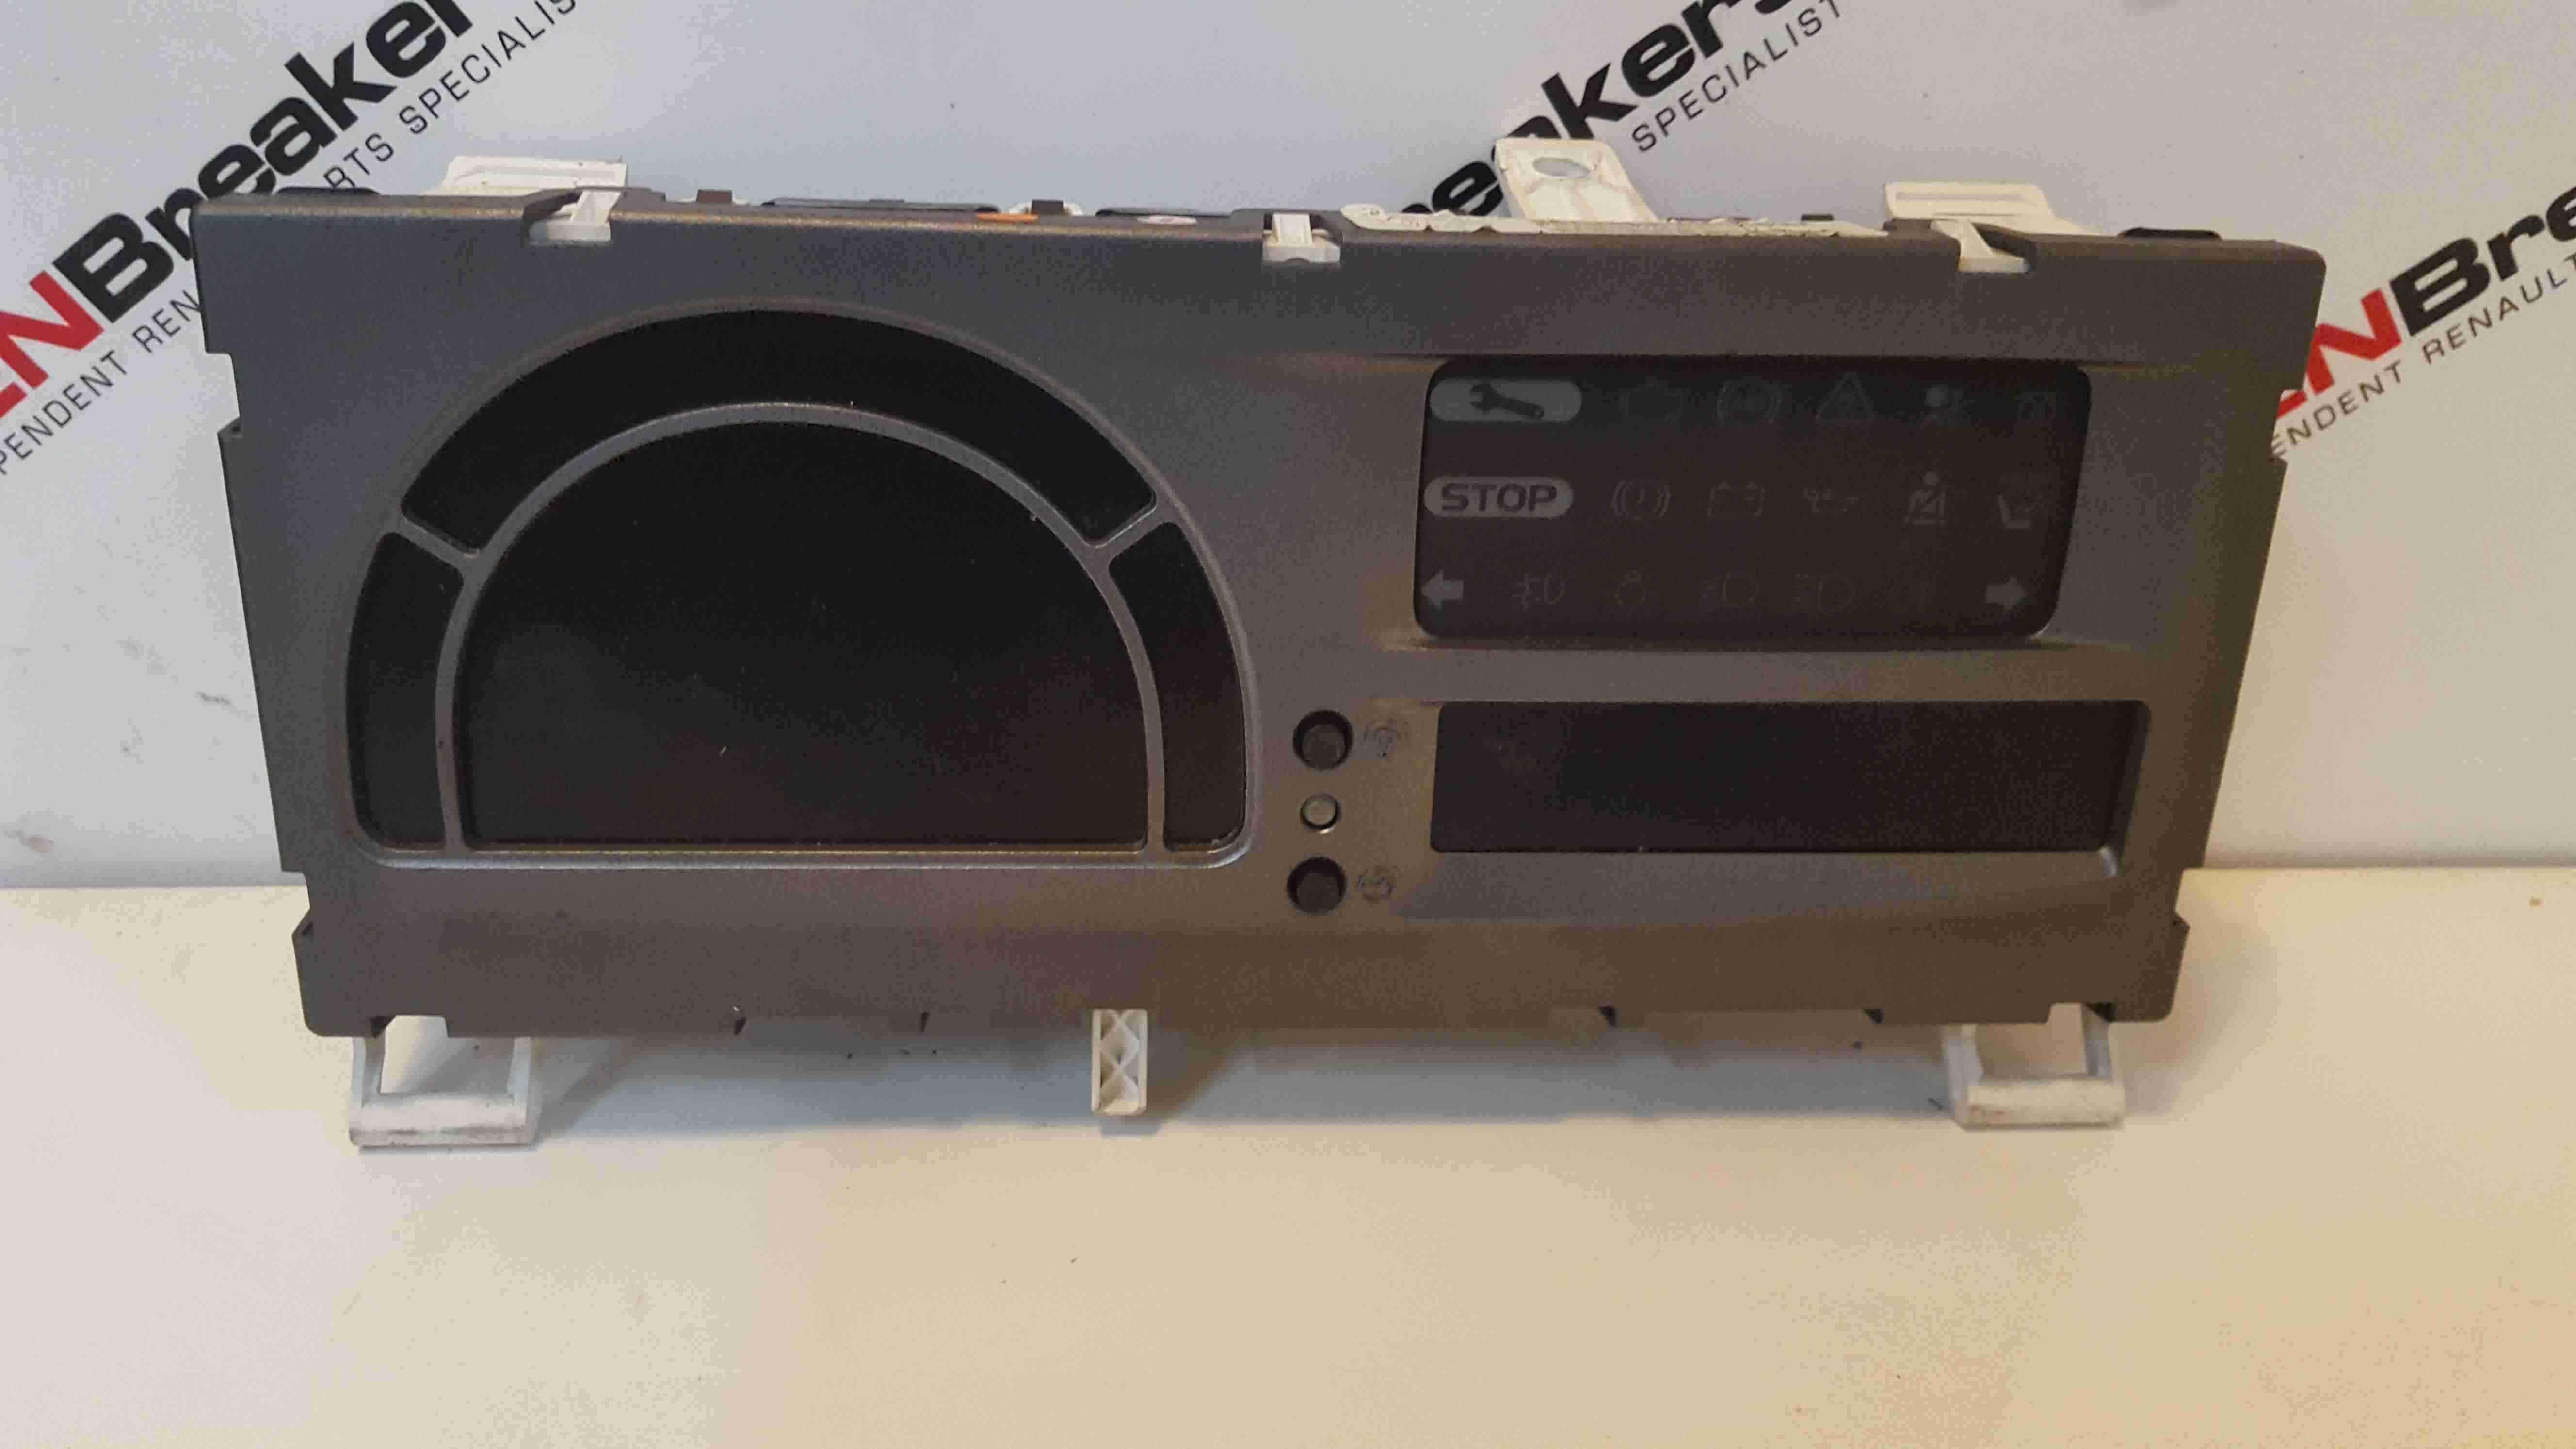 Renault Modus 2004-2008 Instrument Panel Dials Clocks S Auto 8200453604